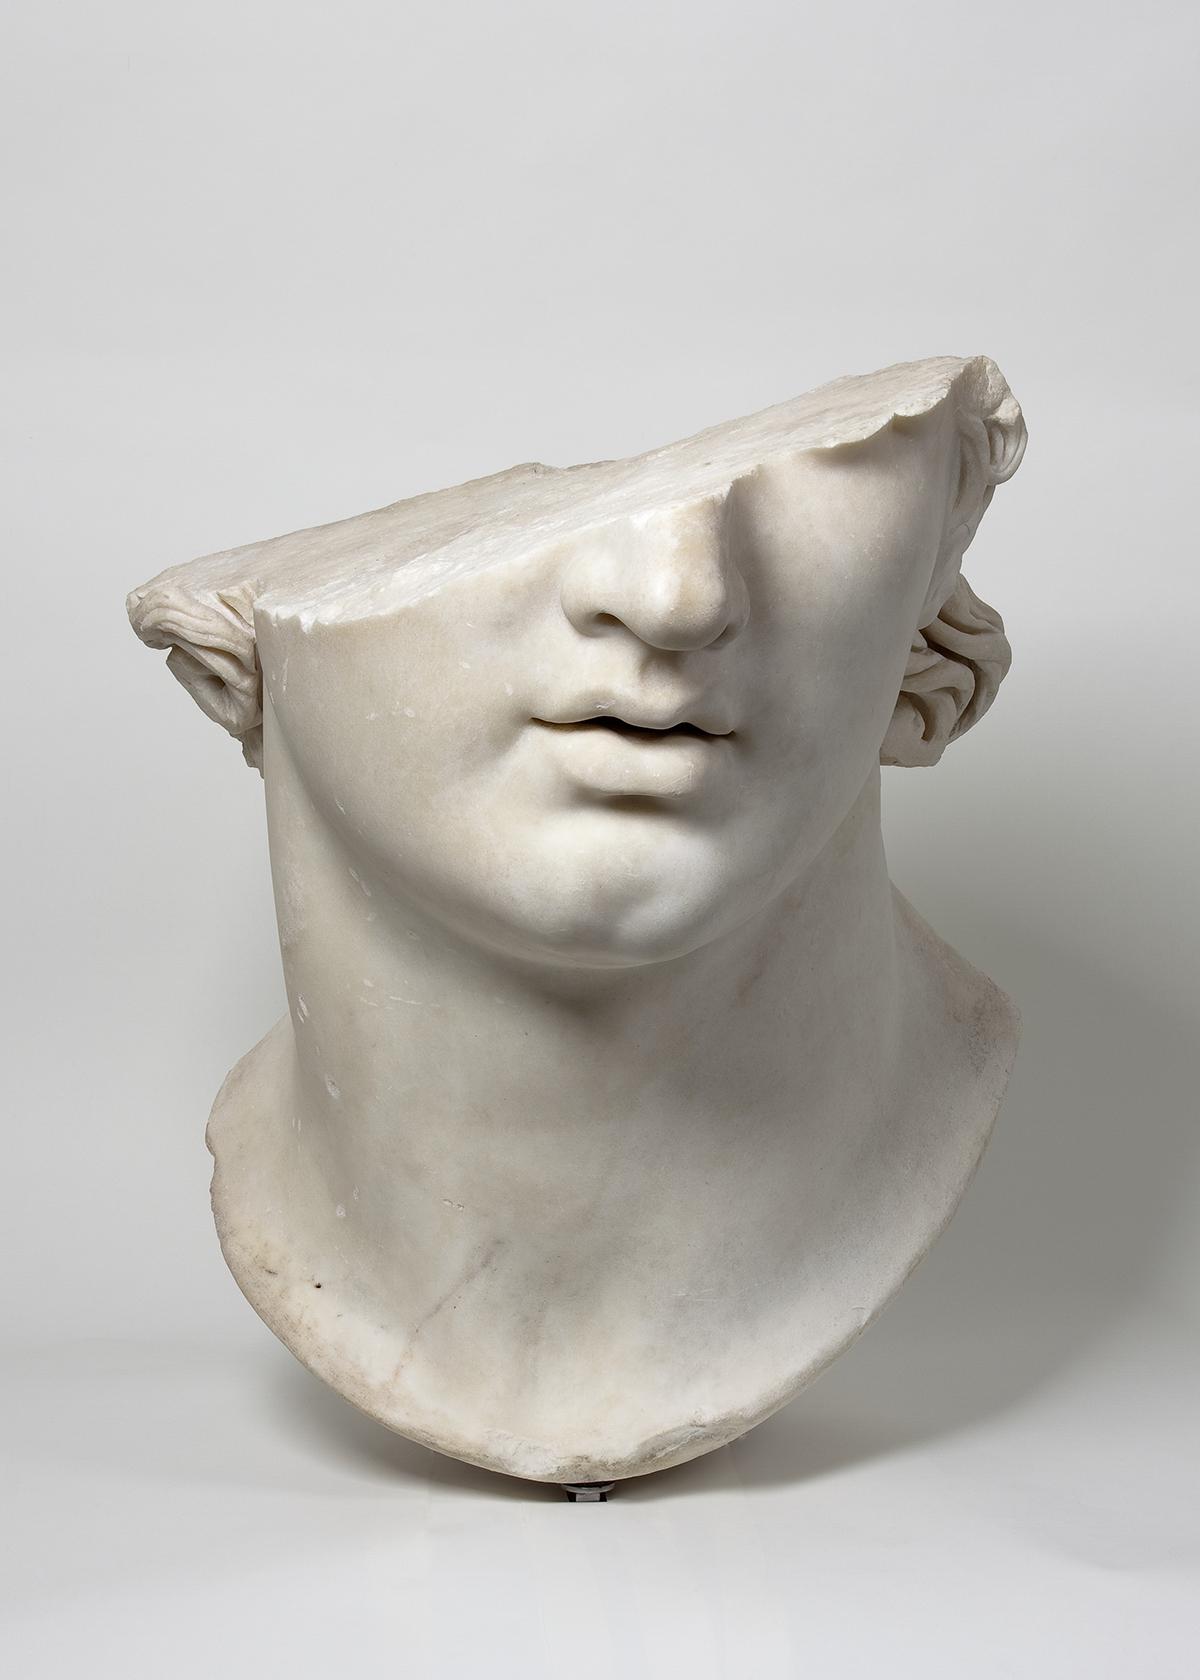 """Fragmentary Colossal Head of a Youth,"" Greek, Hellenistic period, 2nd century B.C., marble.Antikensammlung, Staatliche Museen zu Berlin (AvP VII 283).Images © SMB / Antikensammlung."